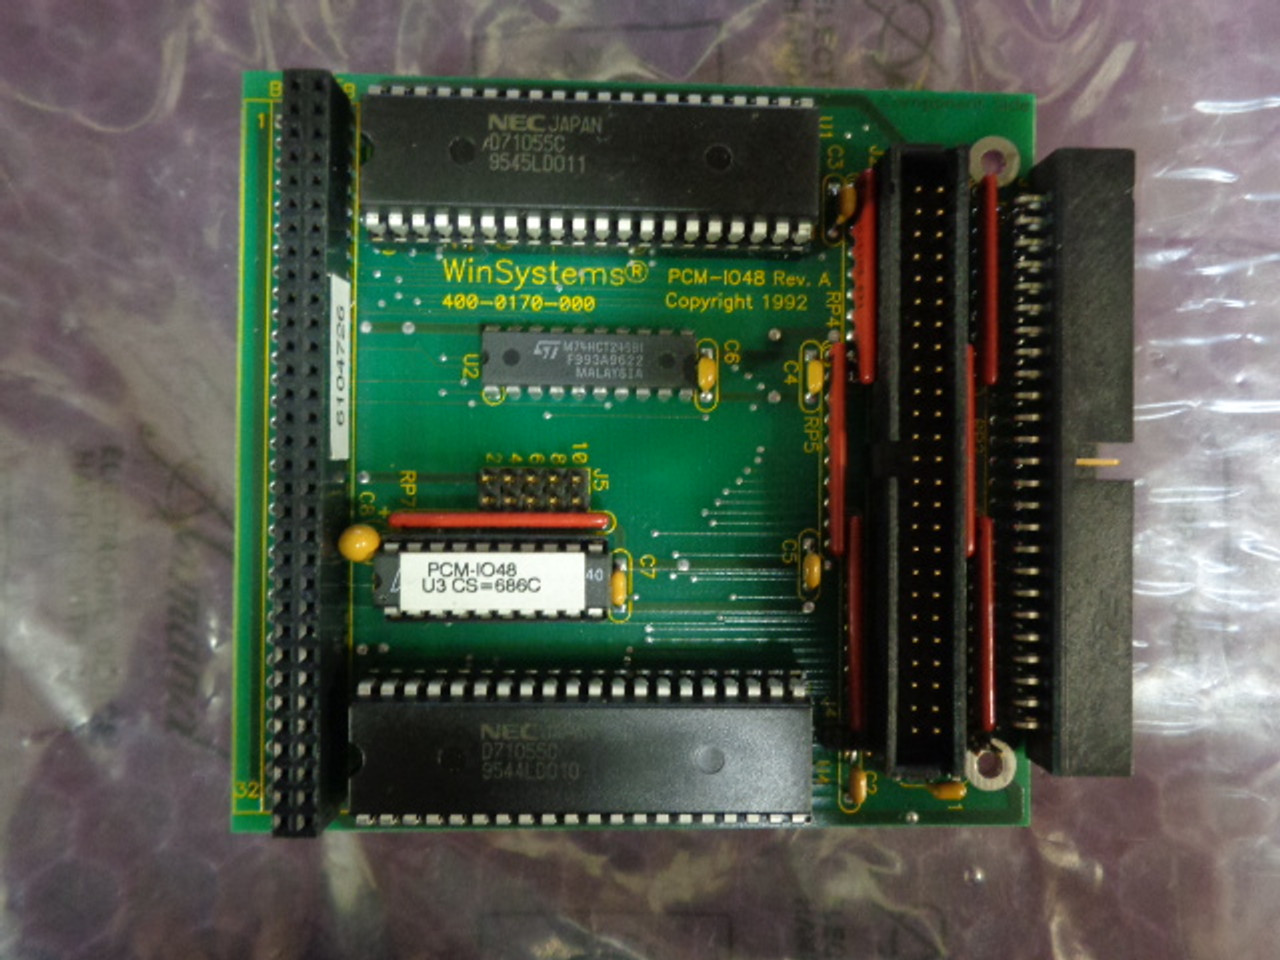 Winsystems 400-0170-000 PCM-1048 Rev. A Circuit Card